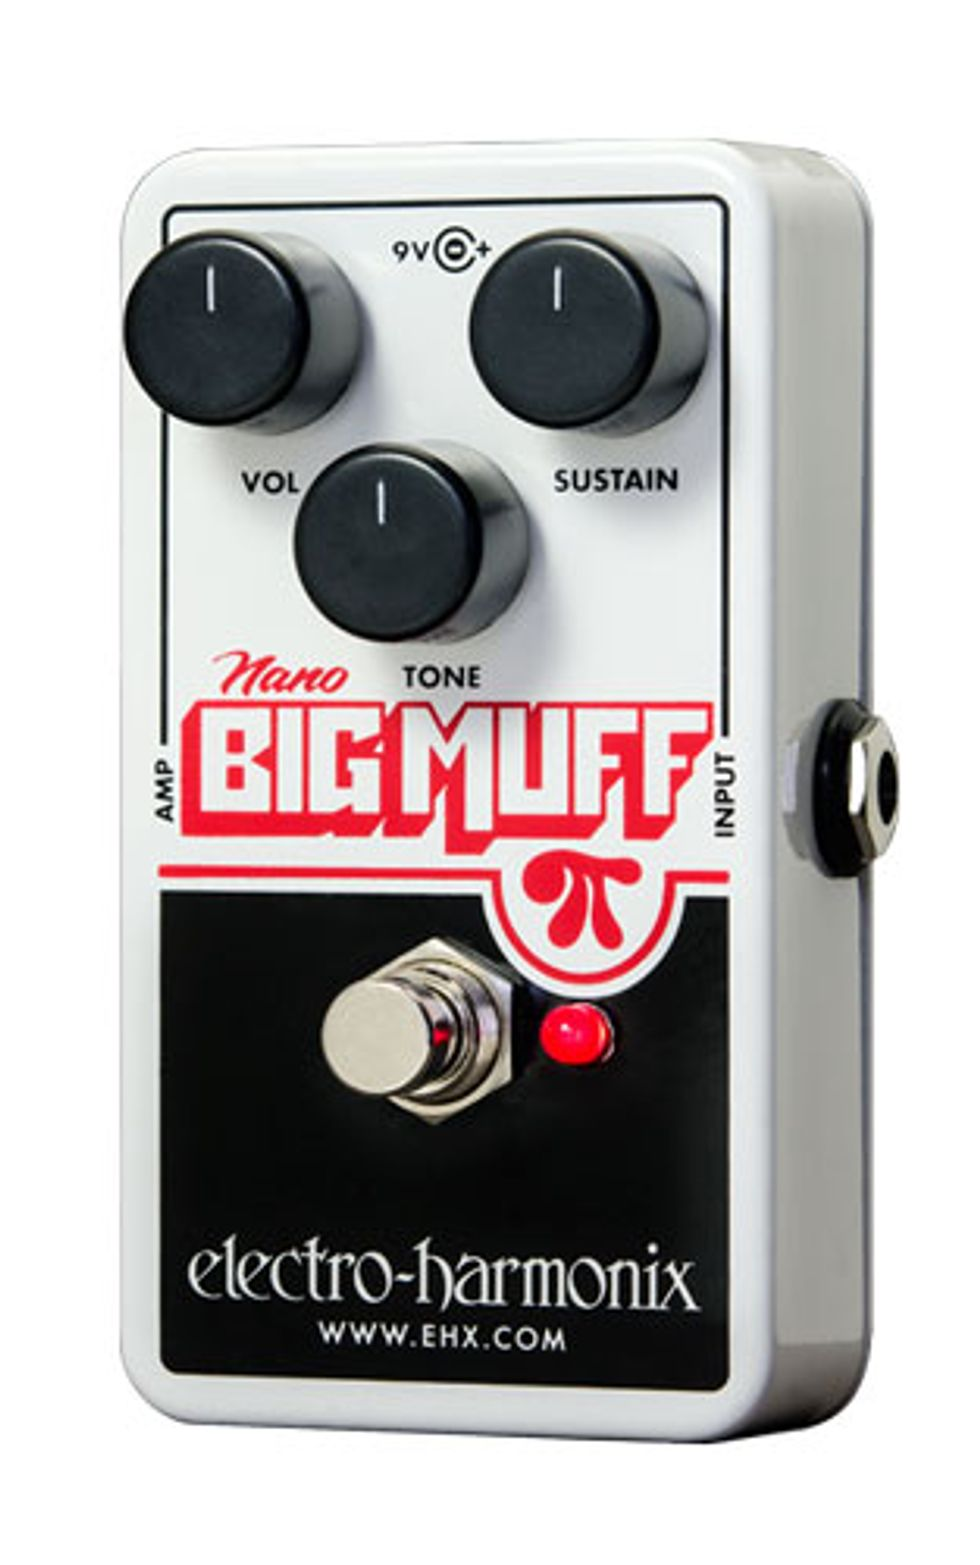 electro harmonix introduces the nano big muff pi 2013 11 25 premier guitar. Black Bedroom Furniture Sets. Home Design Ideas